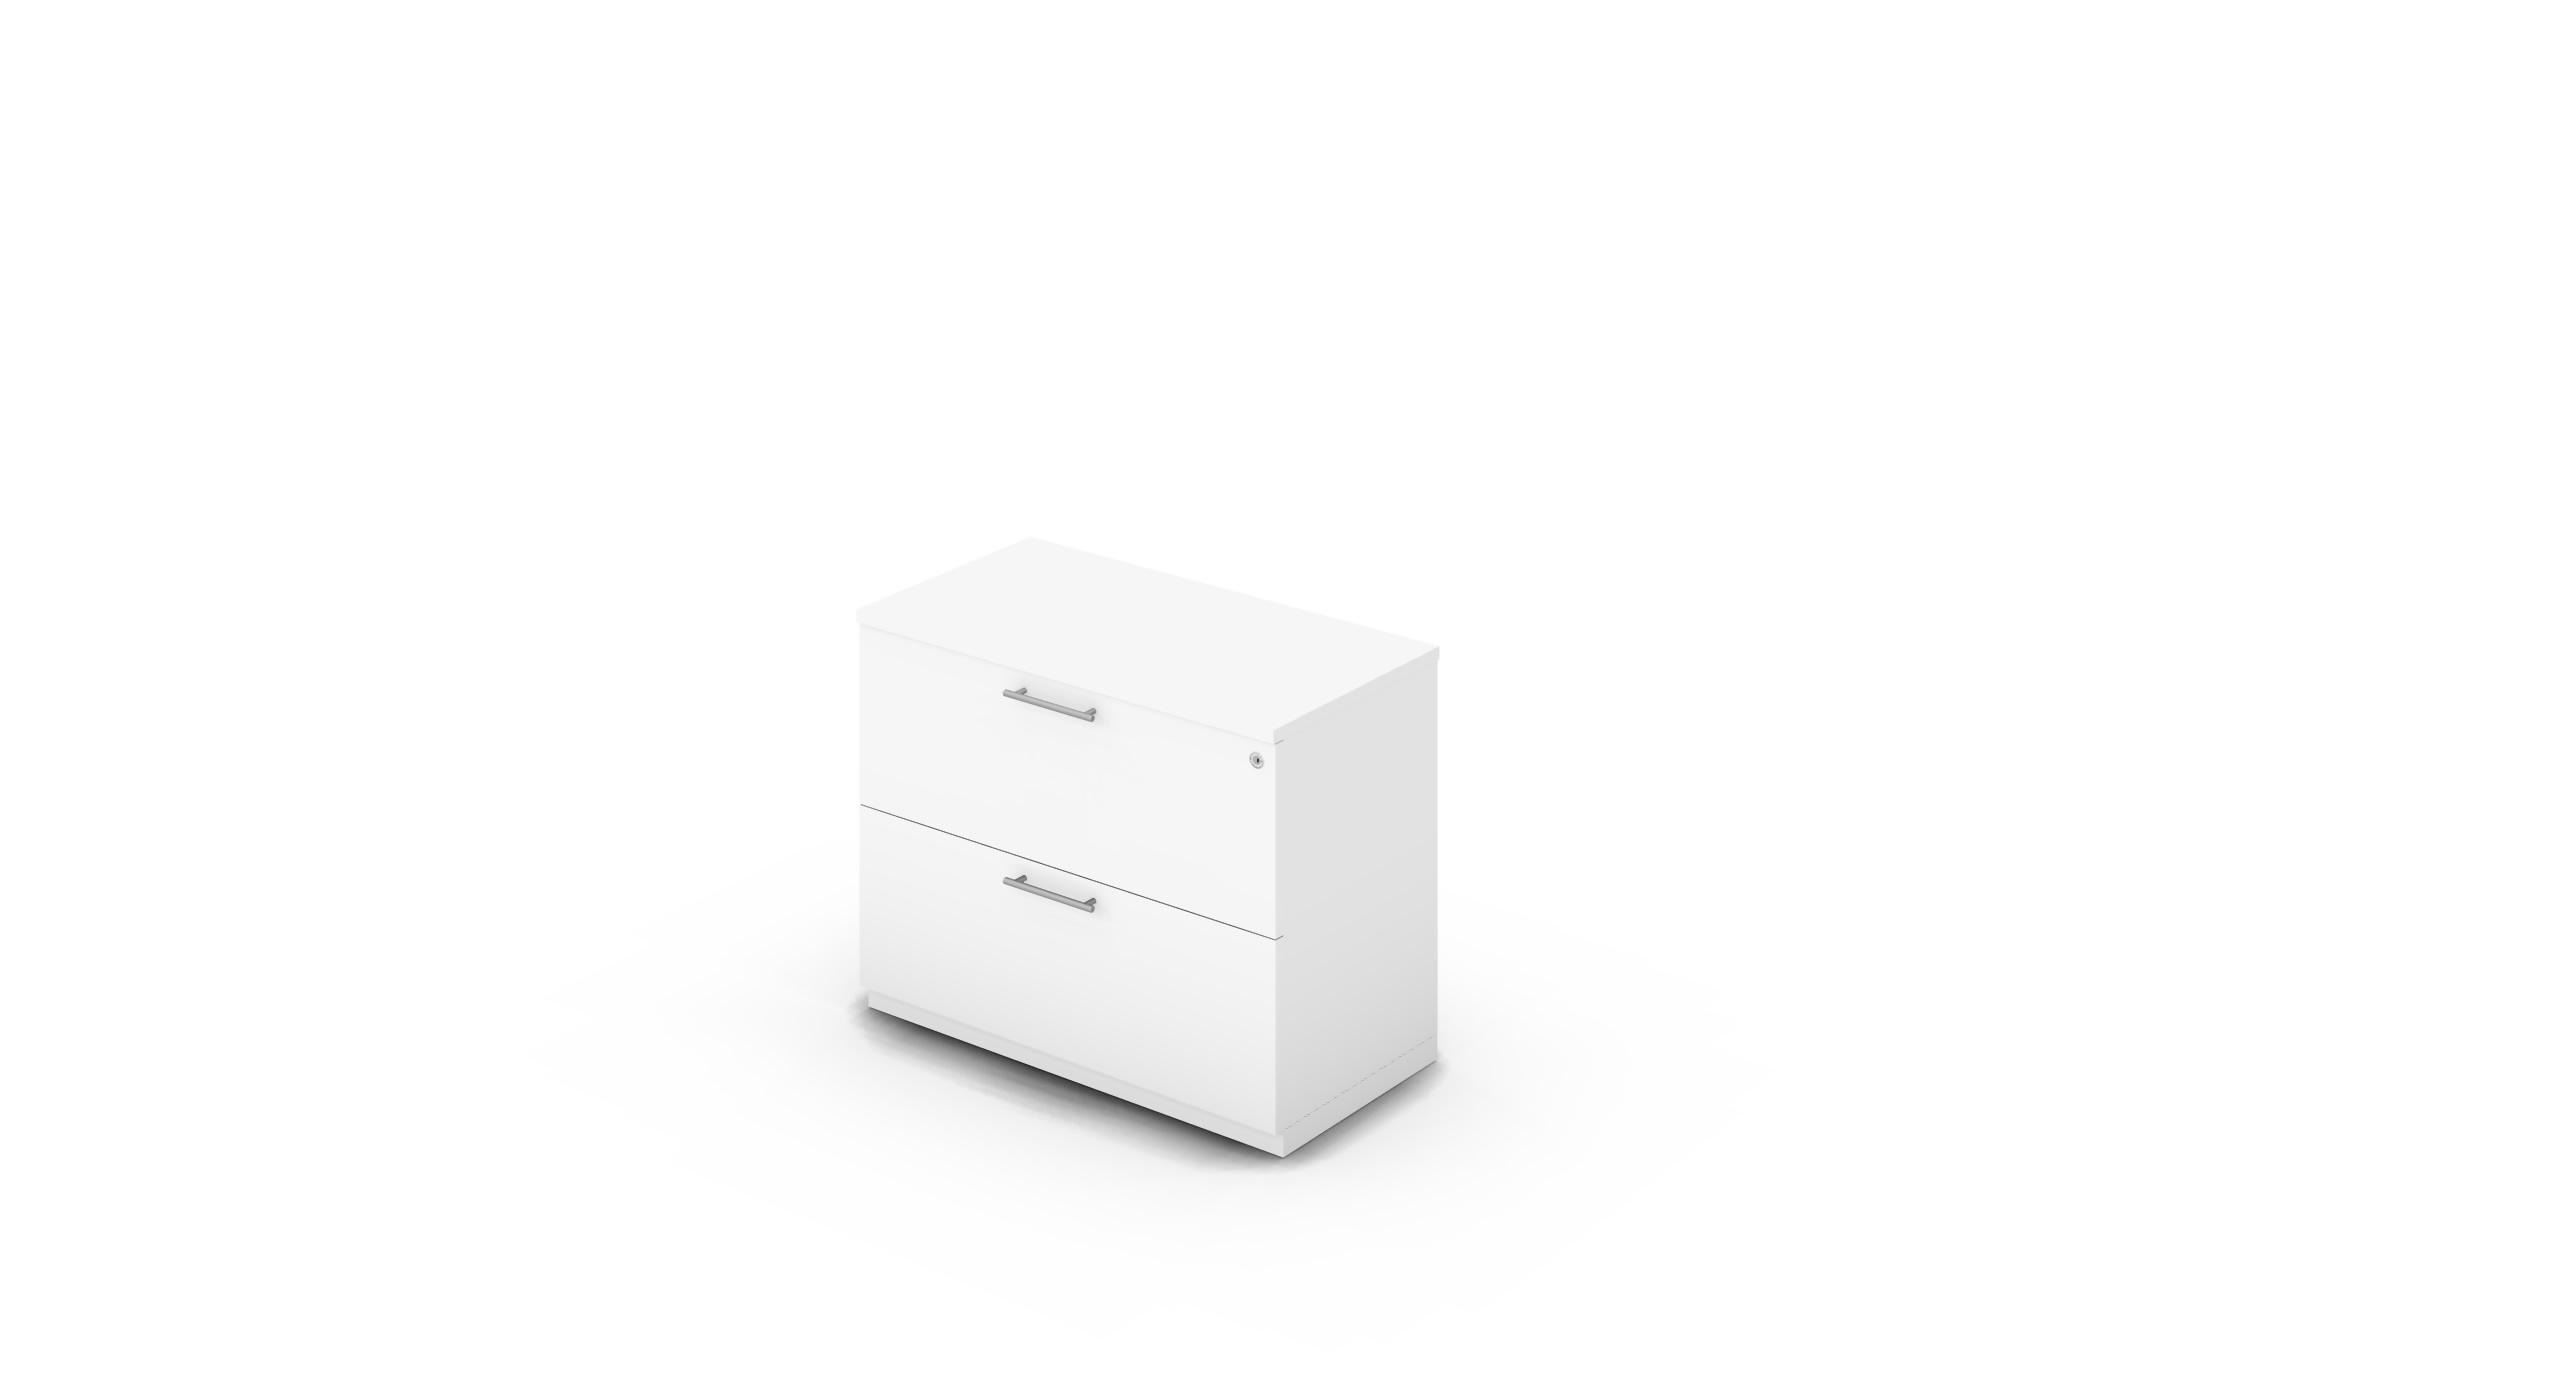 Cabinet_900x450x775_DR_White_Bar_Round_WithCylinder